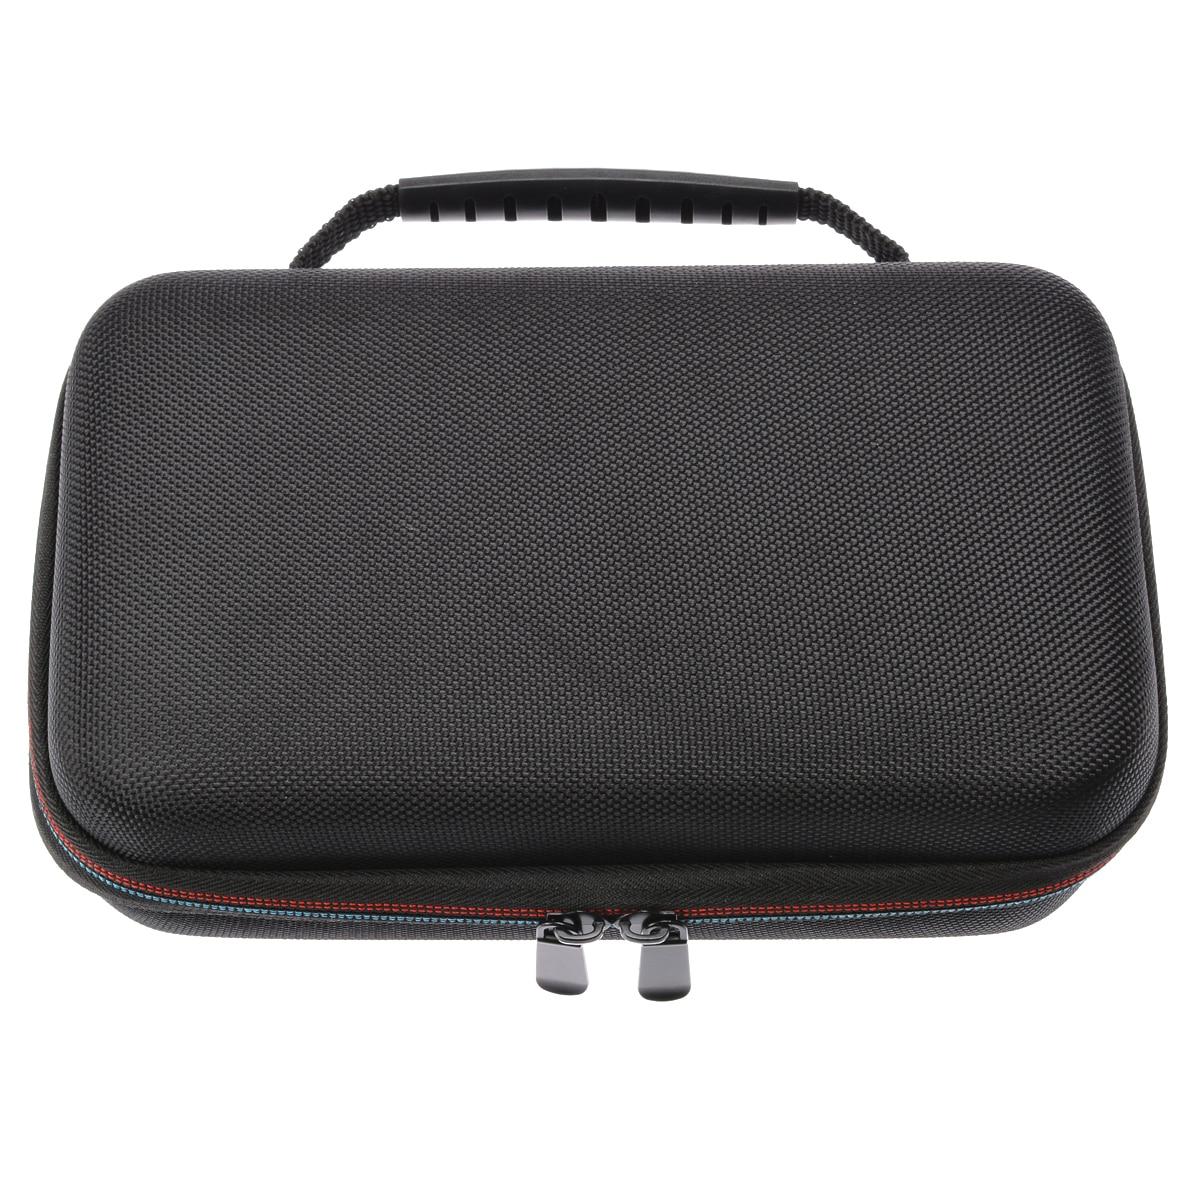 Multimeter Storage Bag Black Cloth Multipurpose Instrument Carry Case Bag Waterproof Case For F117C/ F17B Digital Multimeter